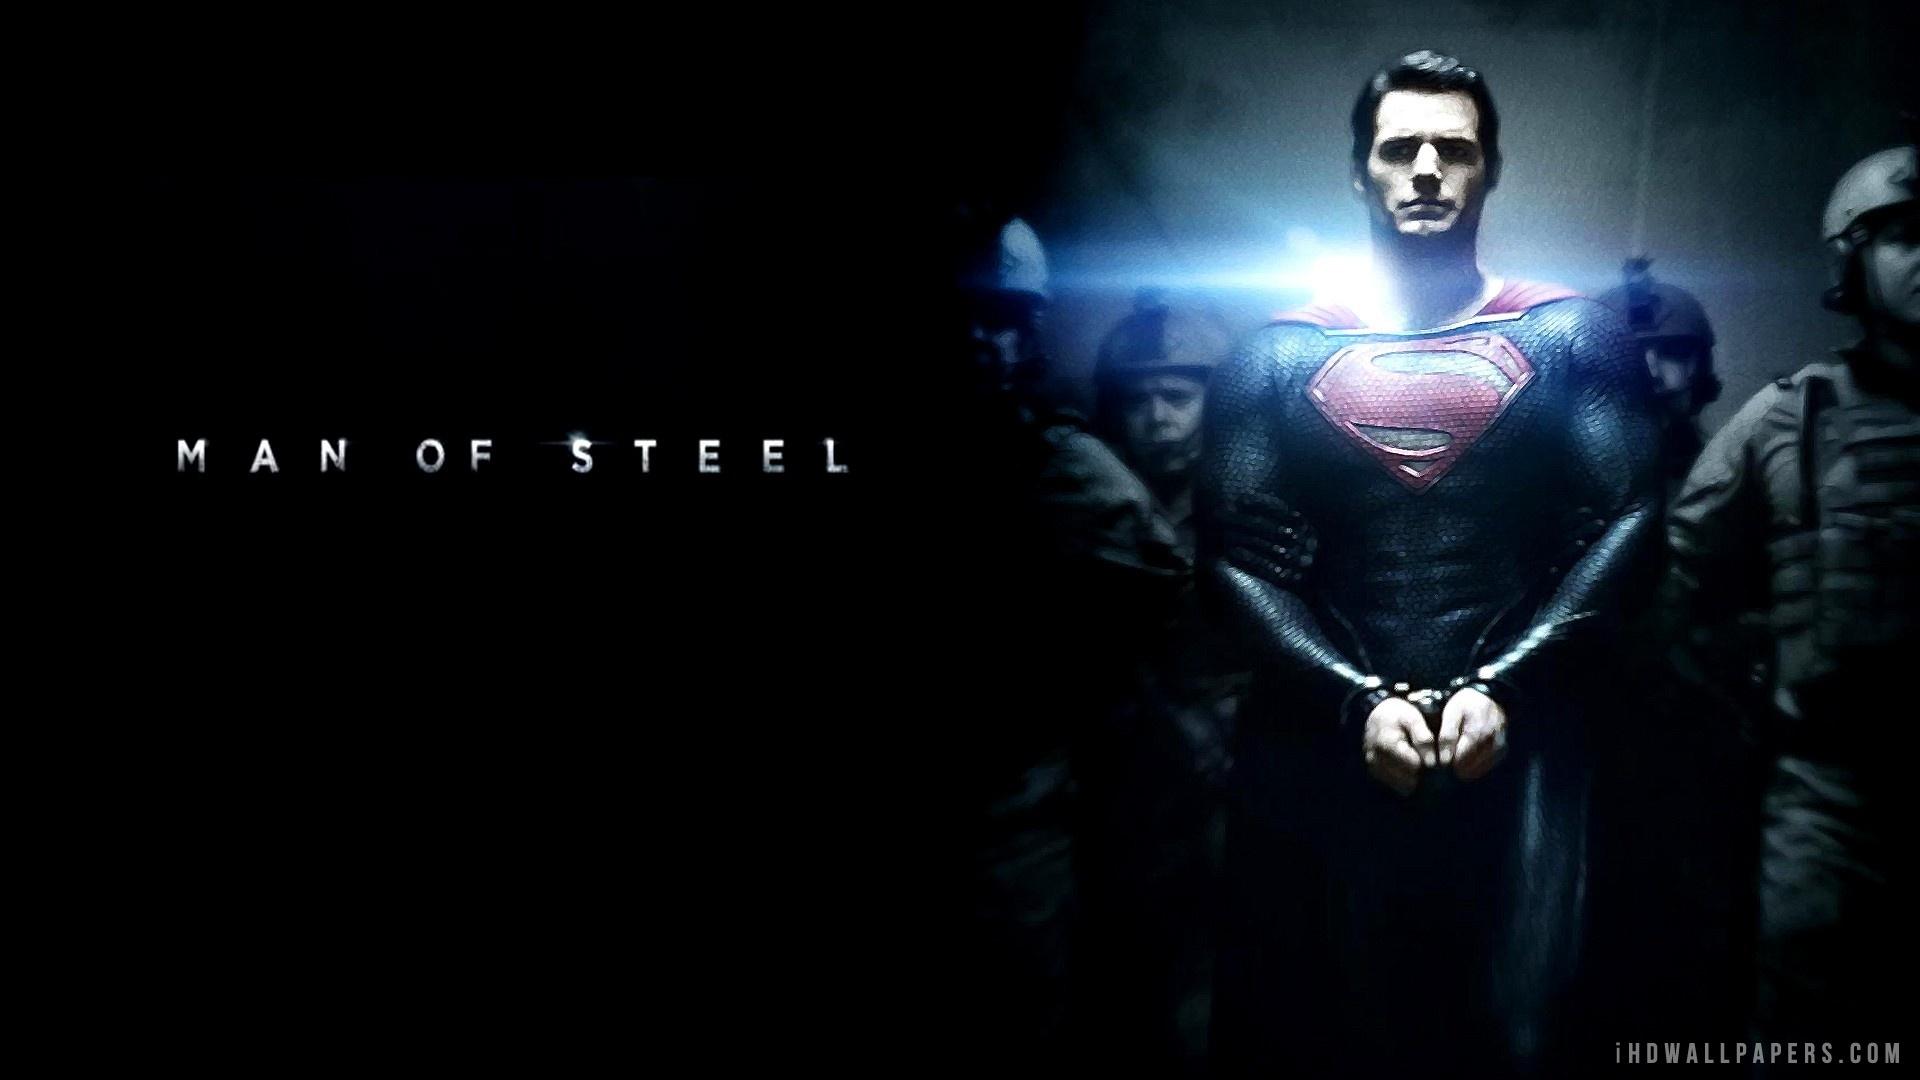 Man of Steel SuperMan HD Wallpaper   iHD Wallpapers 1920x1080